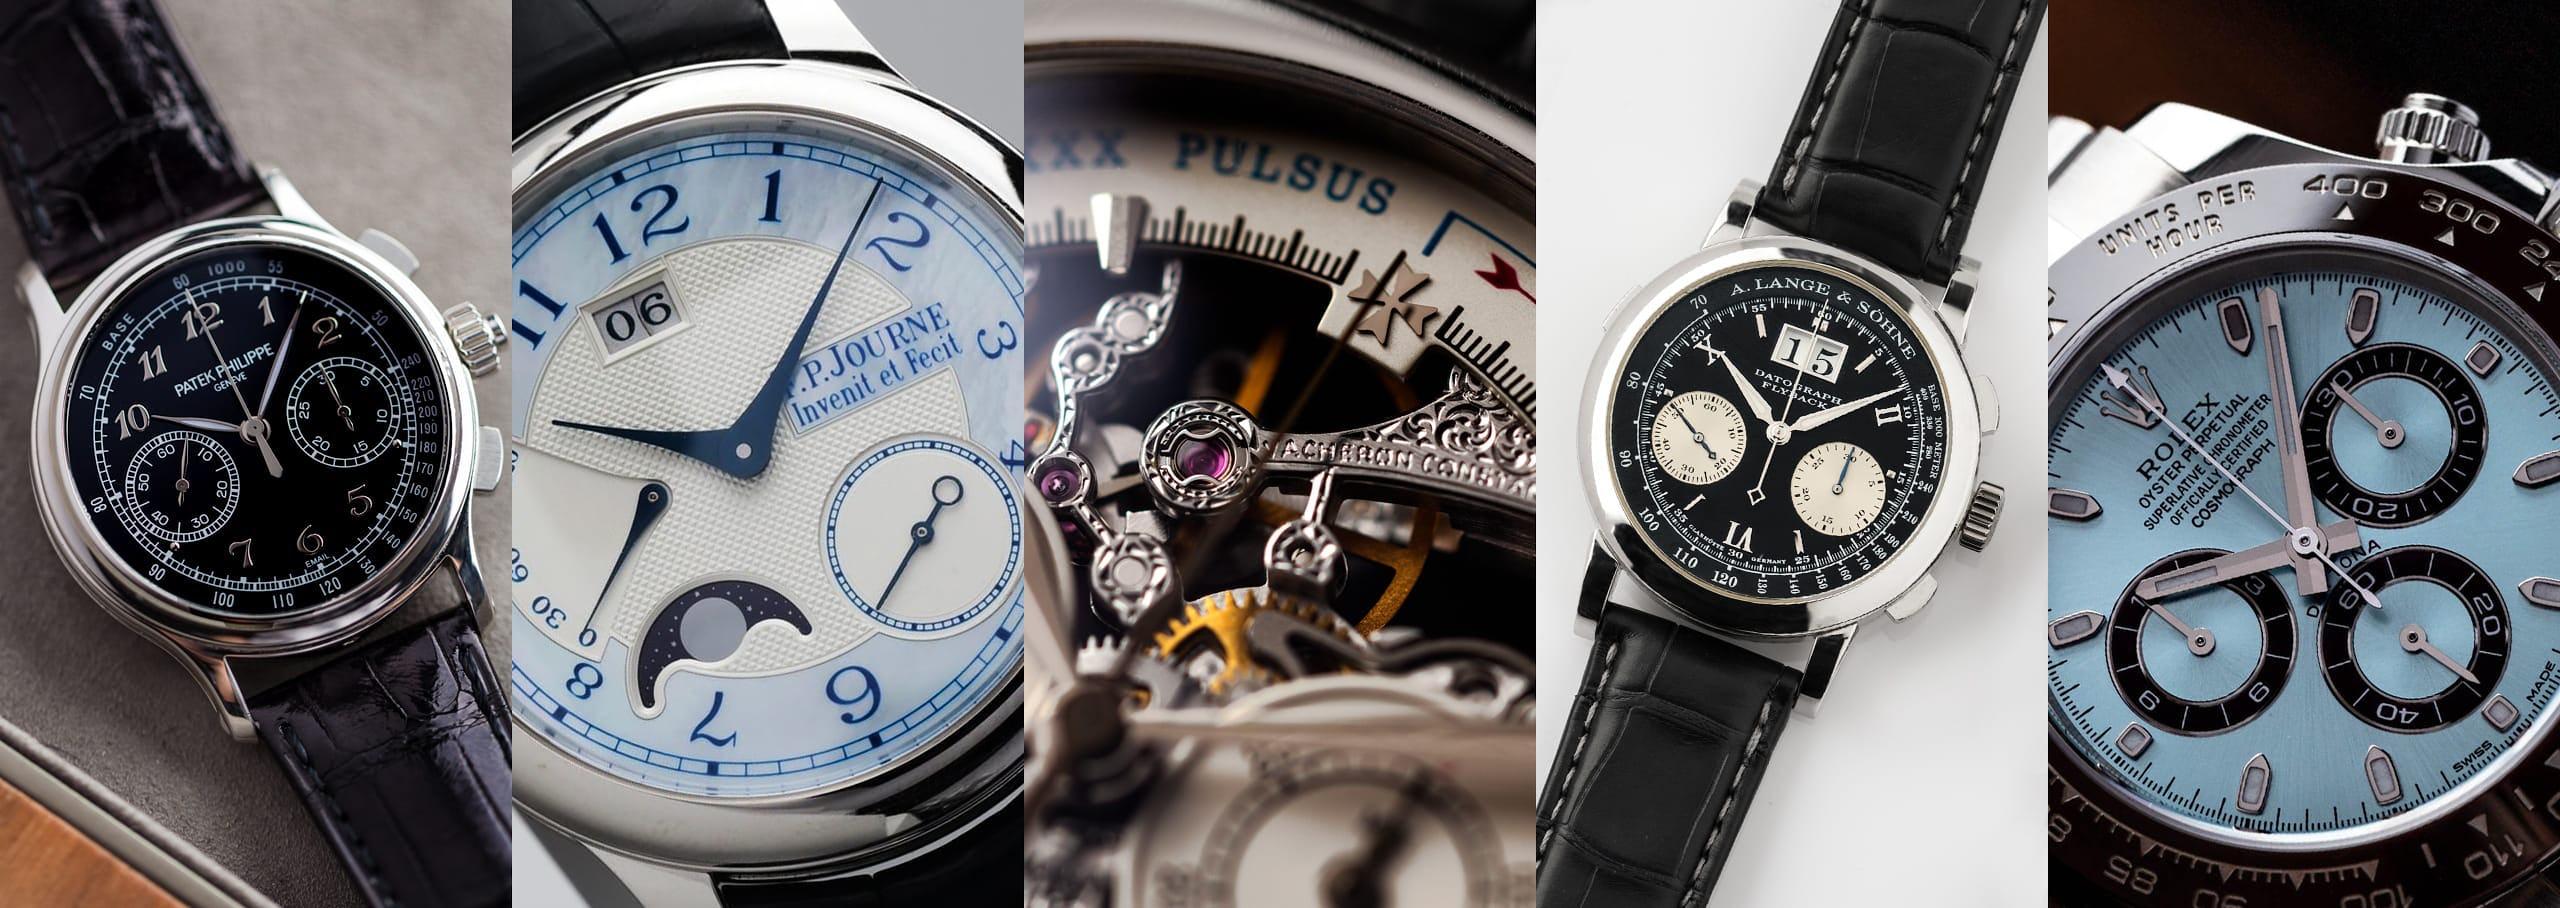 Stealth Wealth: The Wonderful World of Platinum Watches